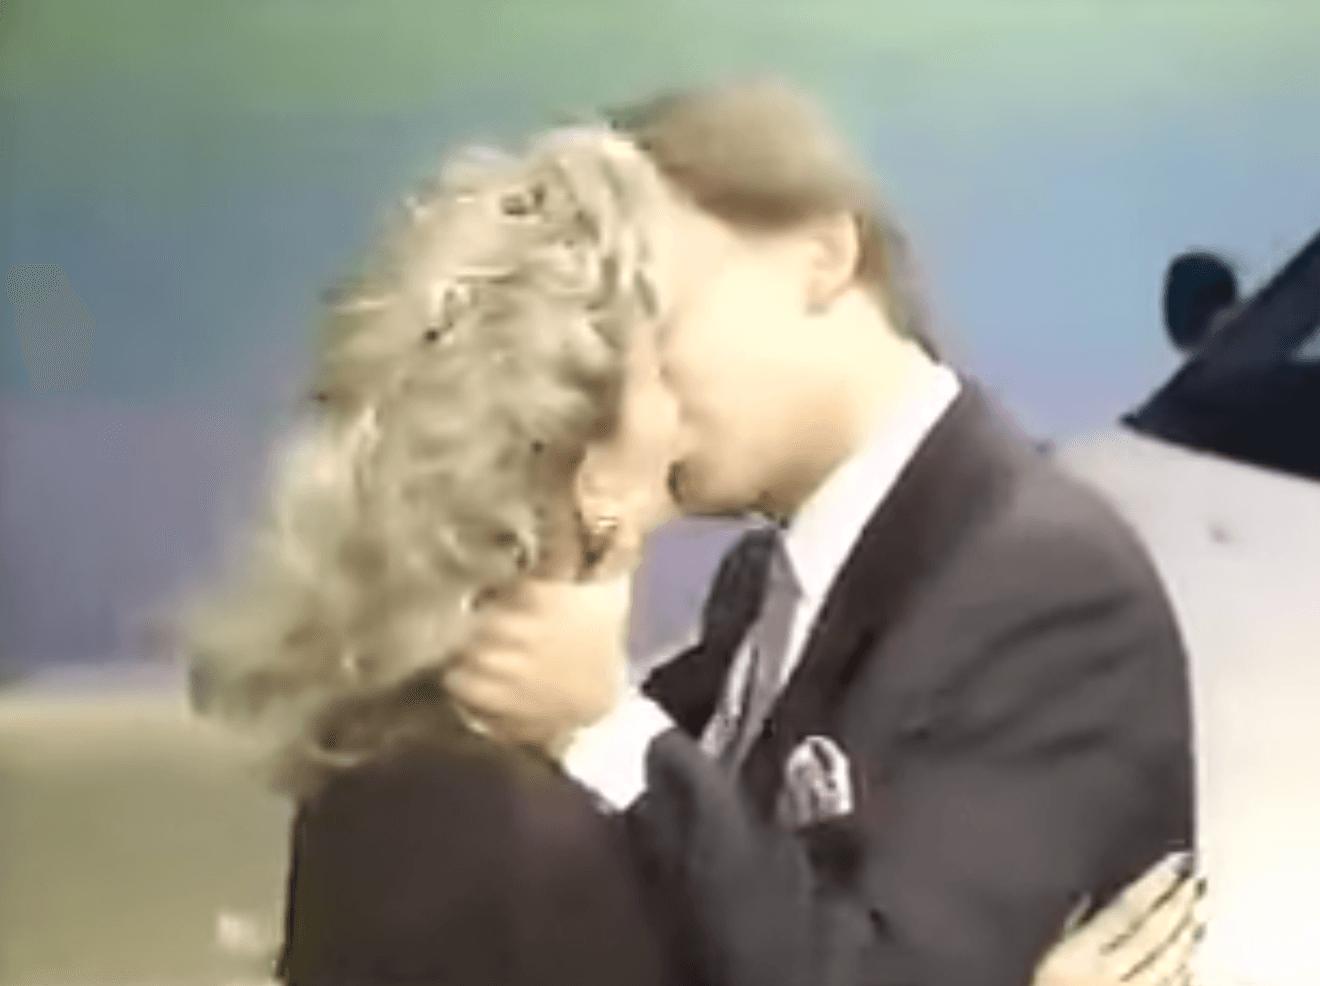 Vanna White and Pat Sajak kissing